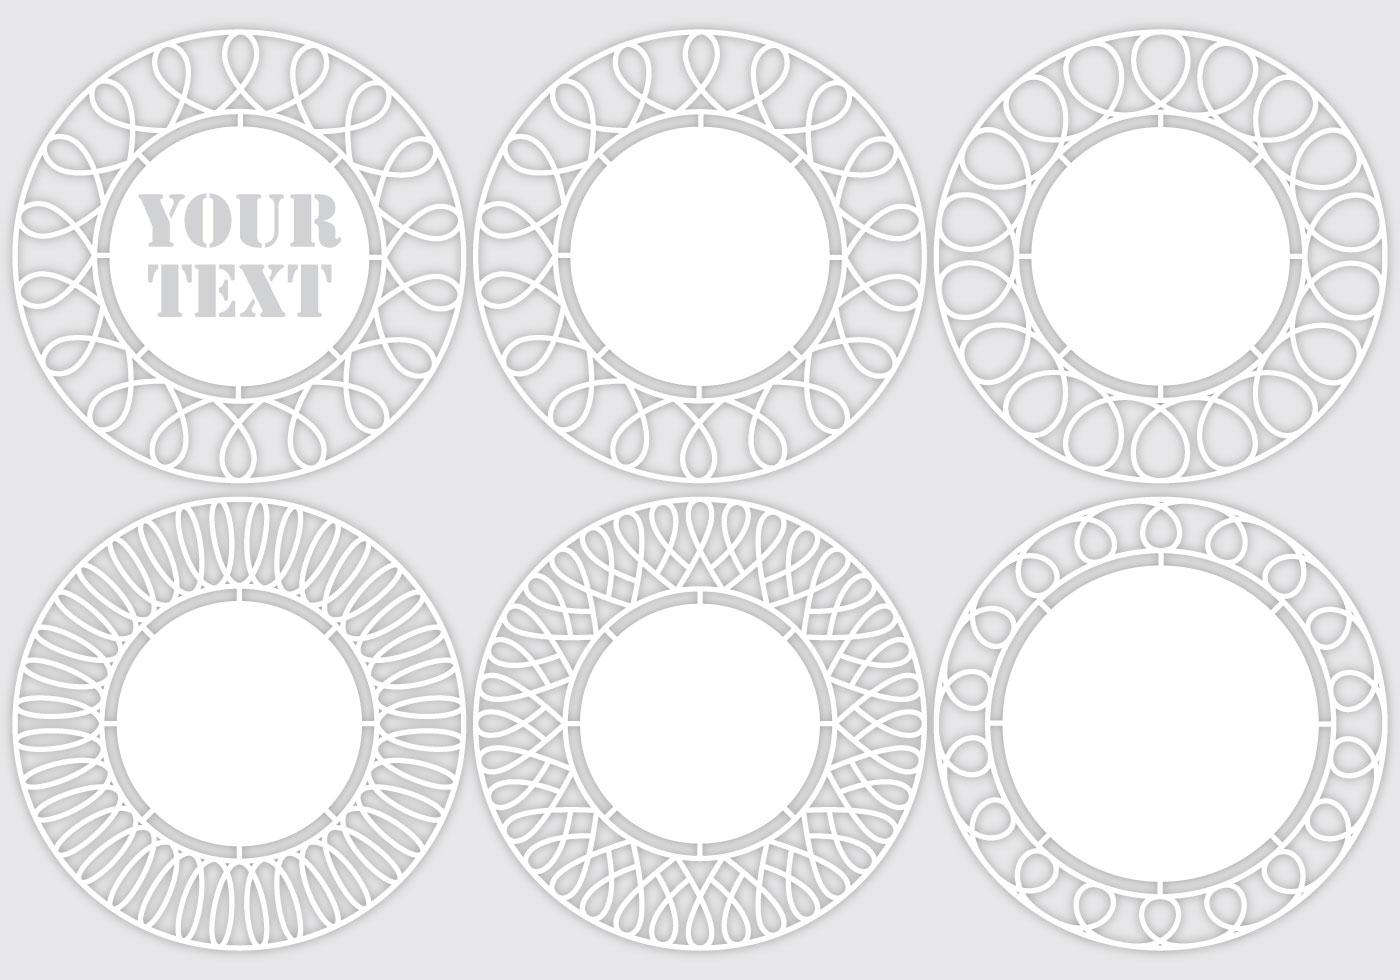 Laser Cut Templates - Download Free Vector Art, Stock Graphics ...